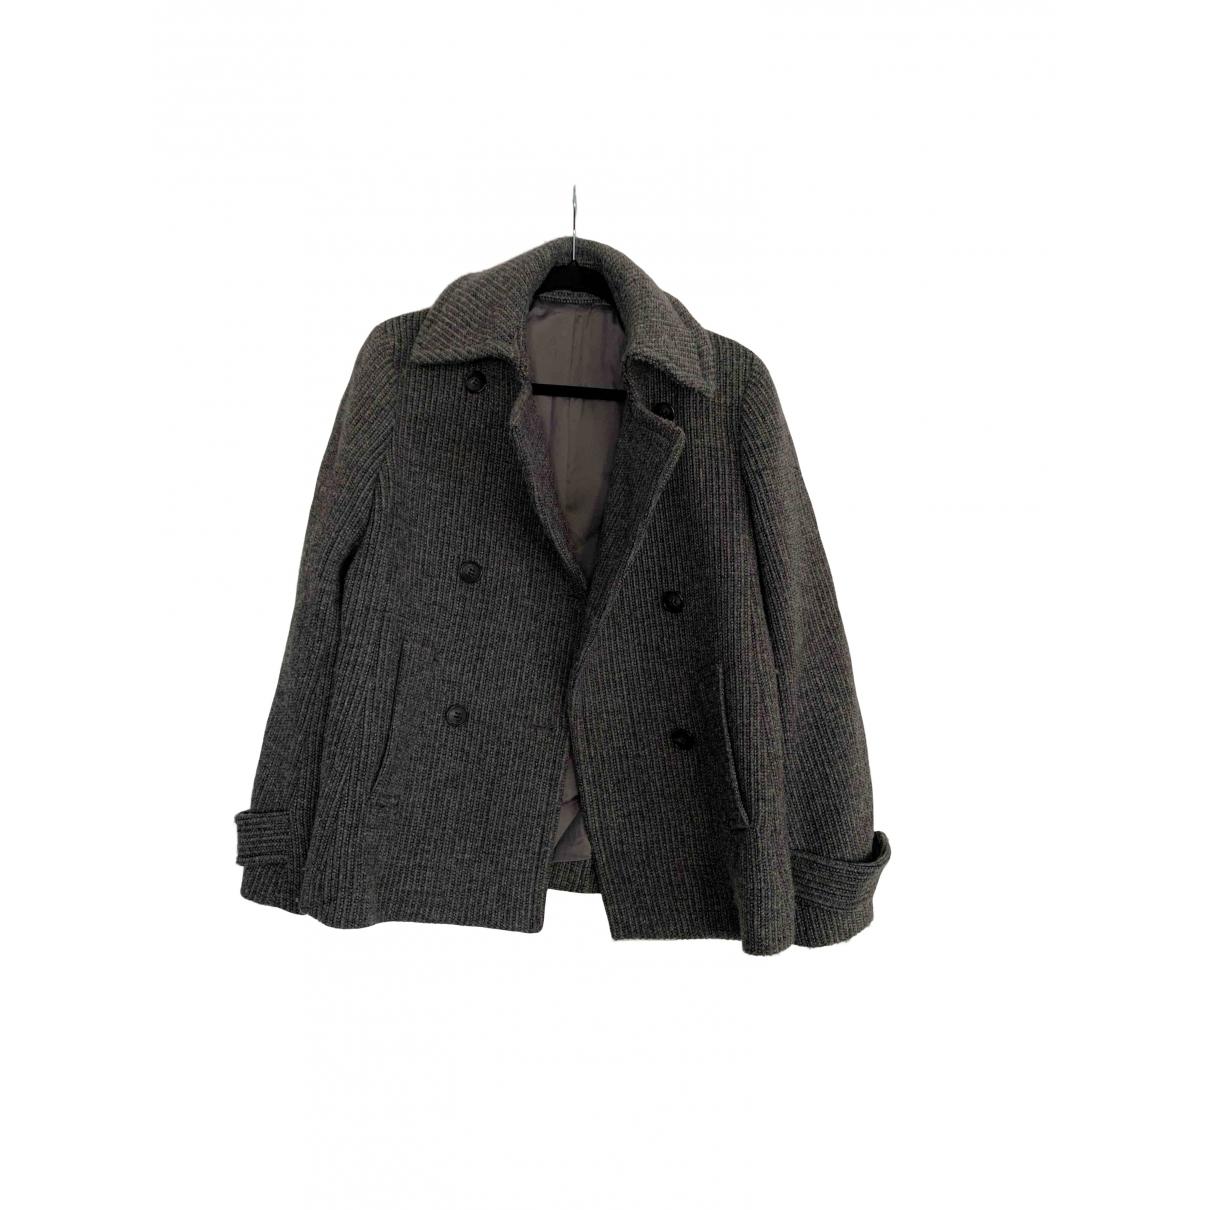 Theory \N Grey Wool jacket for Women L International